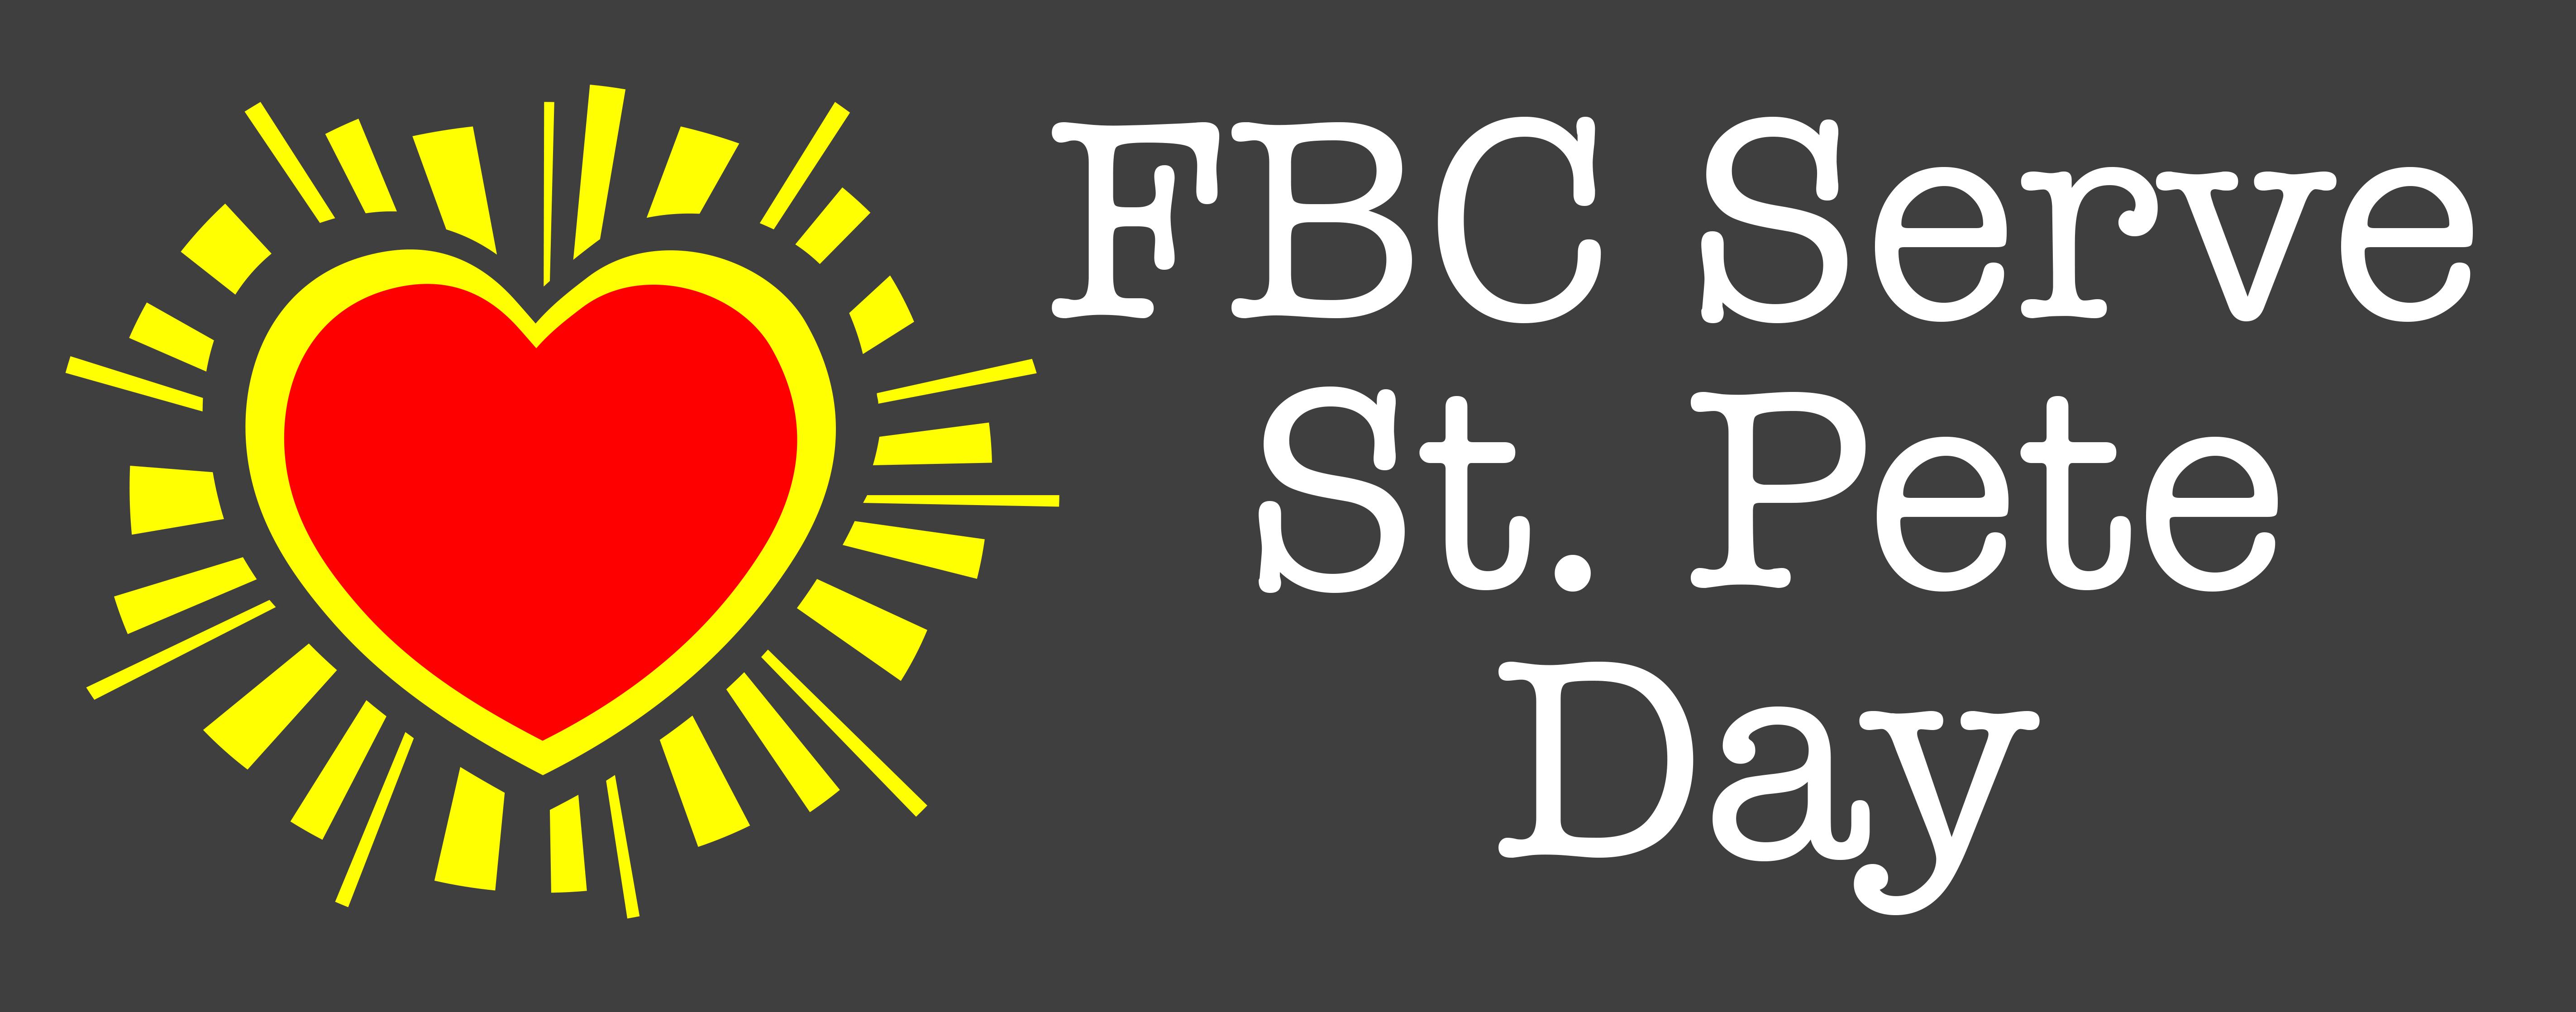 FBC Serve St. Pete Day